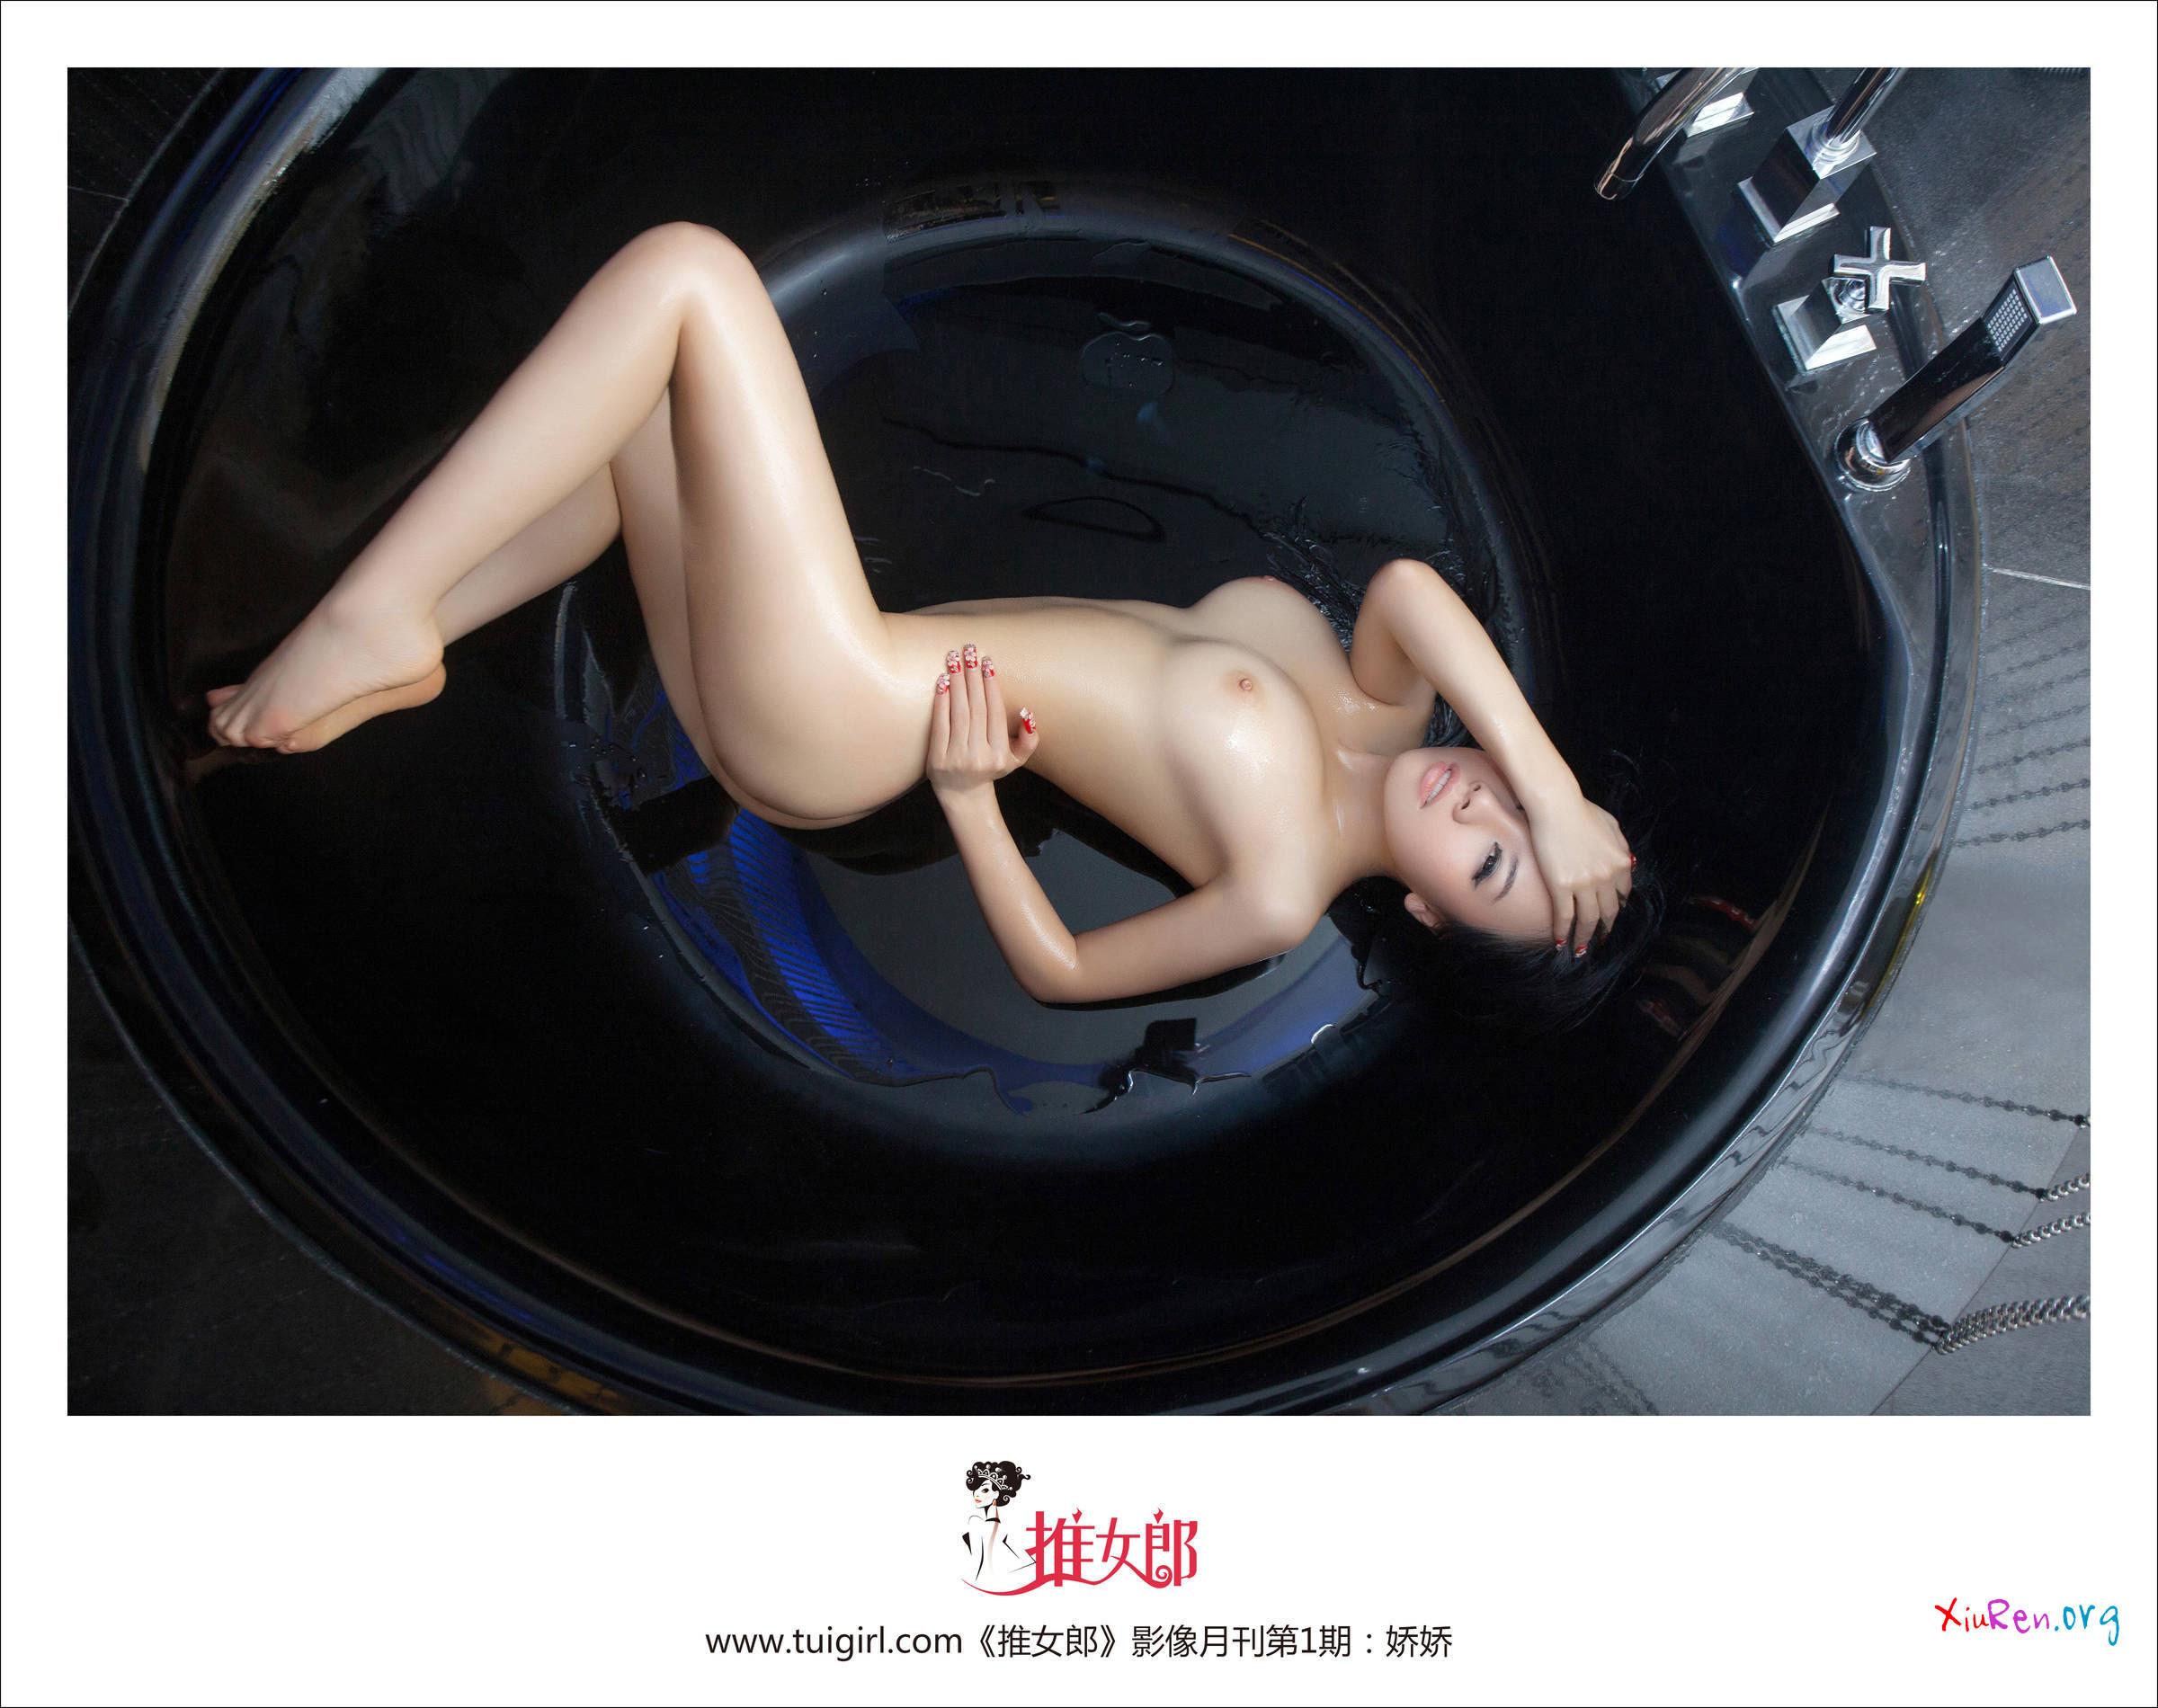 tuigirl-001-jiaojiao-34.jpg